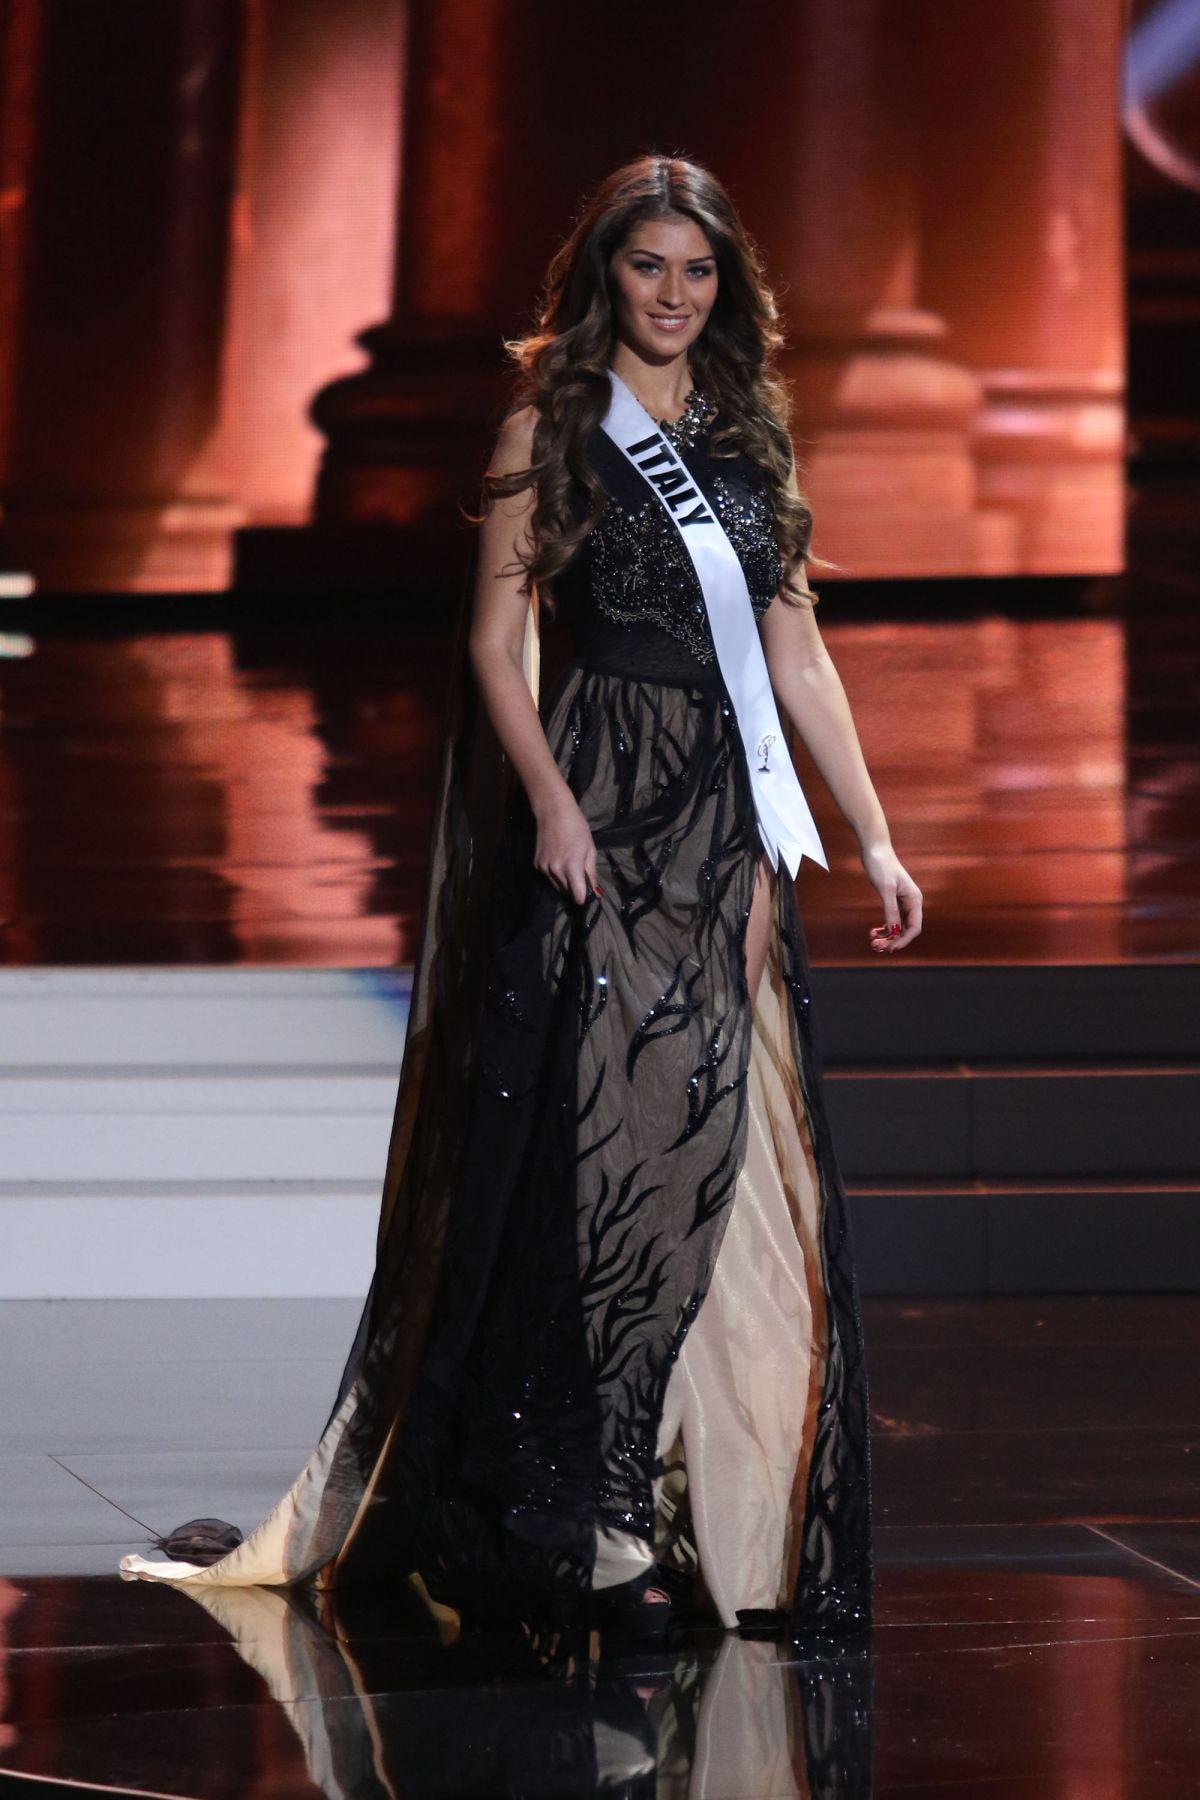 GIADA PEZZAIOLI - Miss Universe 2015 Preliminary Round 12/16/2015